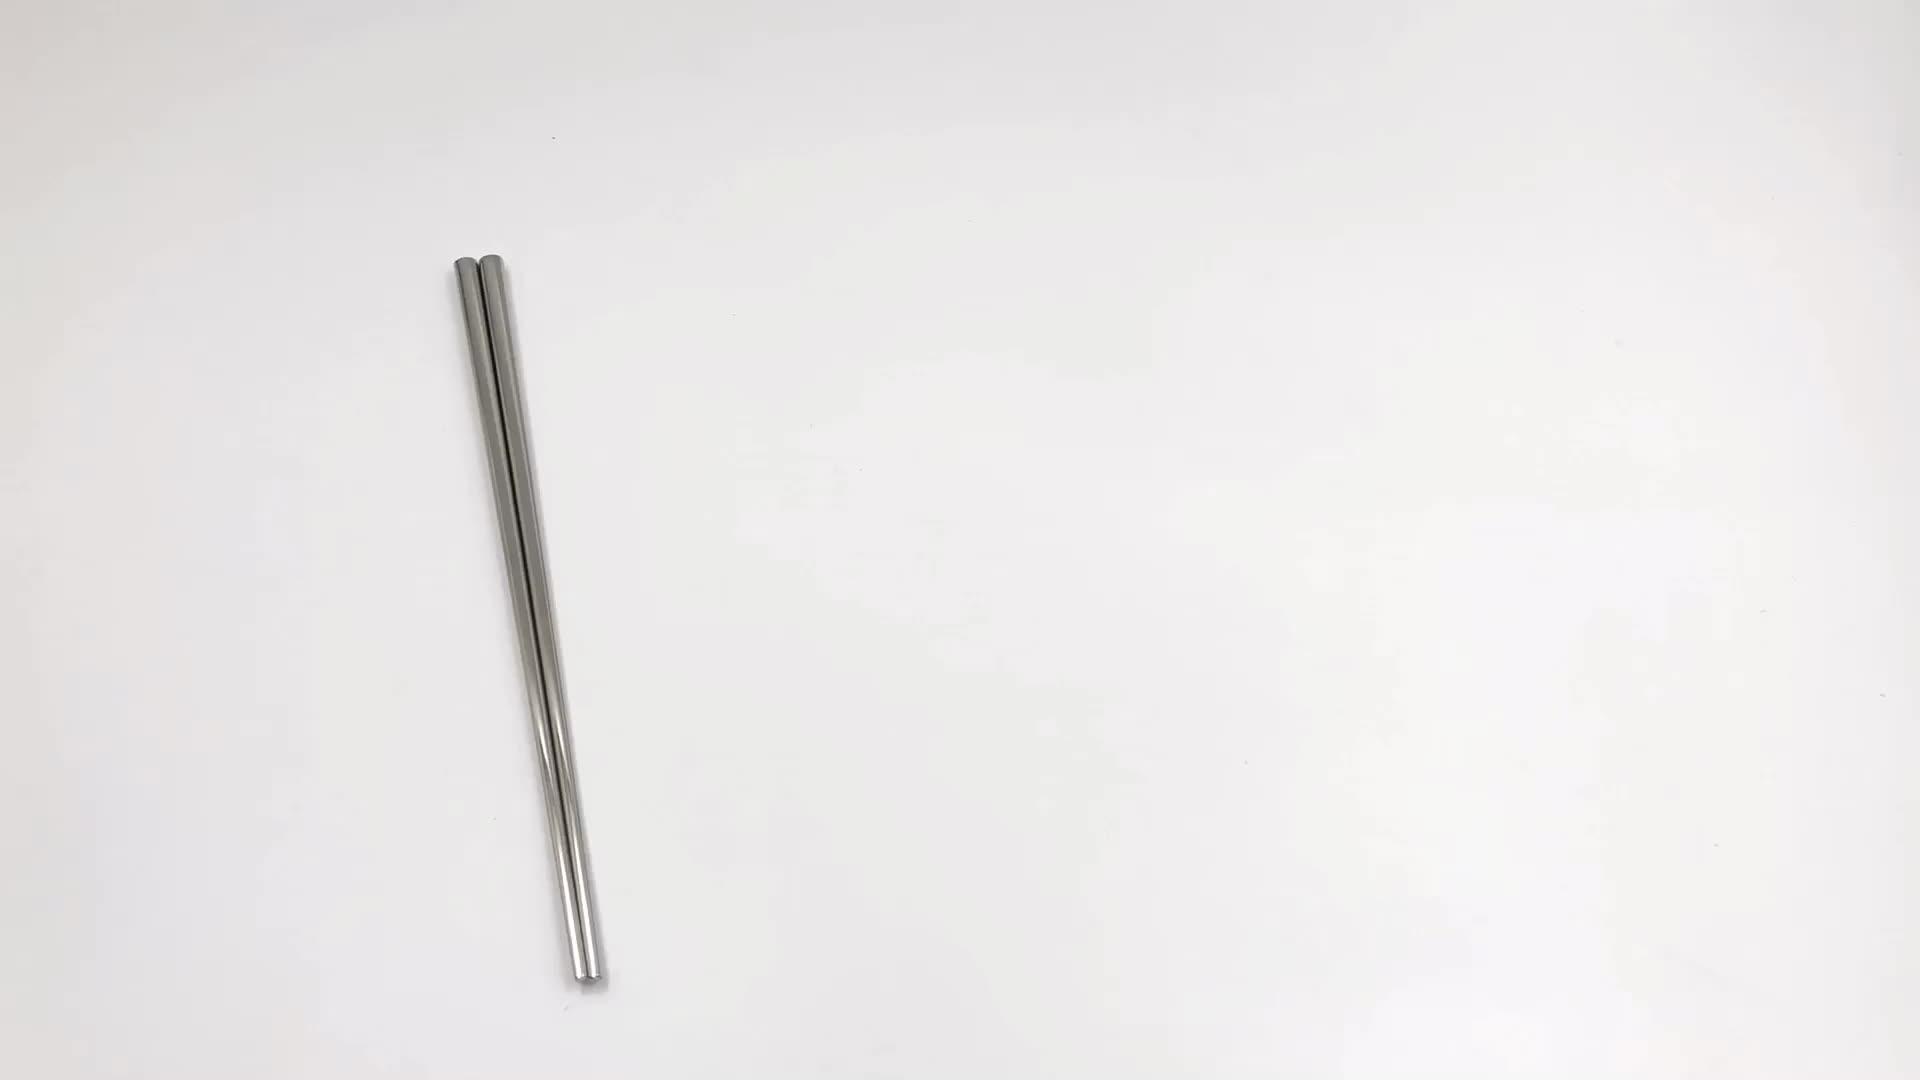 Korean Custom Color Stainless Steel Metal Titanium Chopsticks for Sushi Wedding Gift Souvenirs